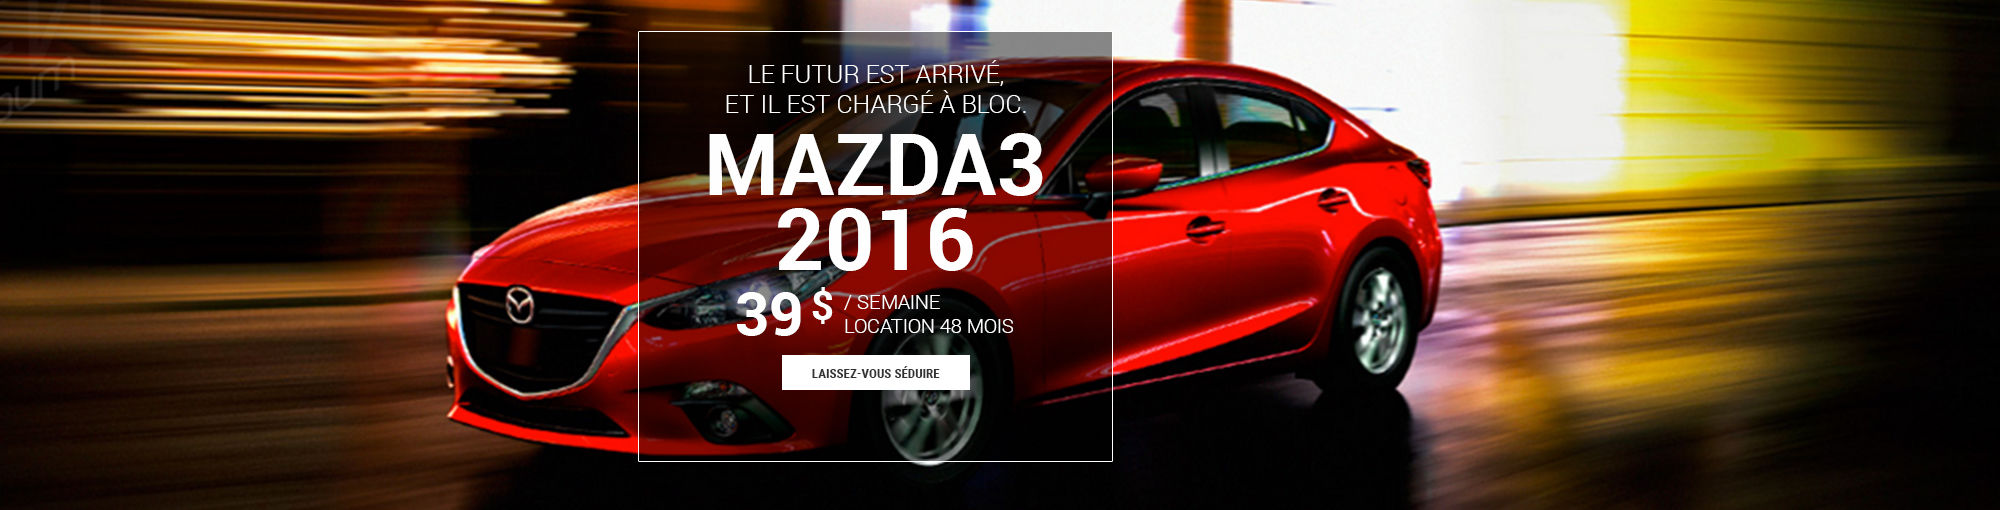 Mazda3 2016 - septembre 2016